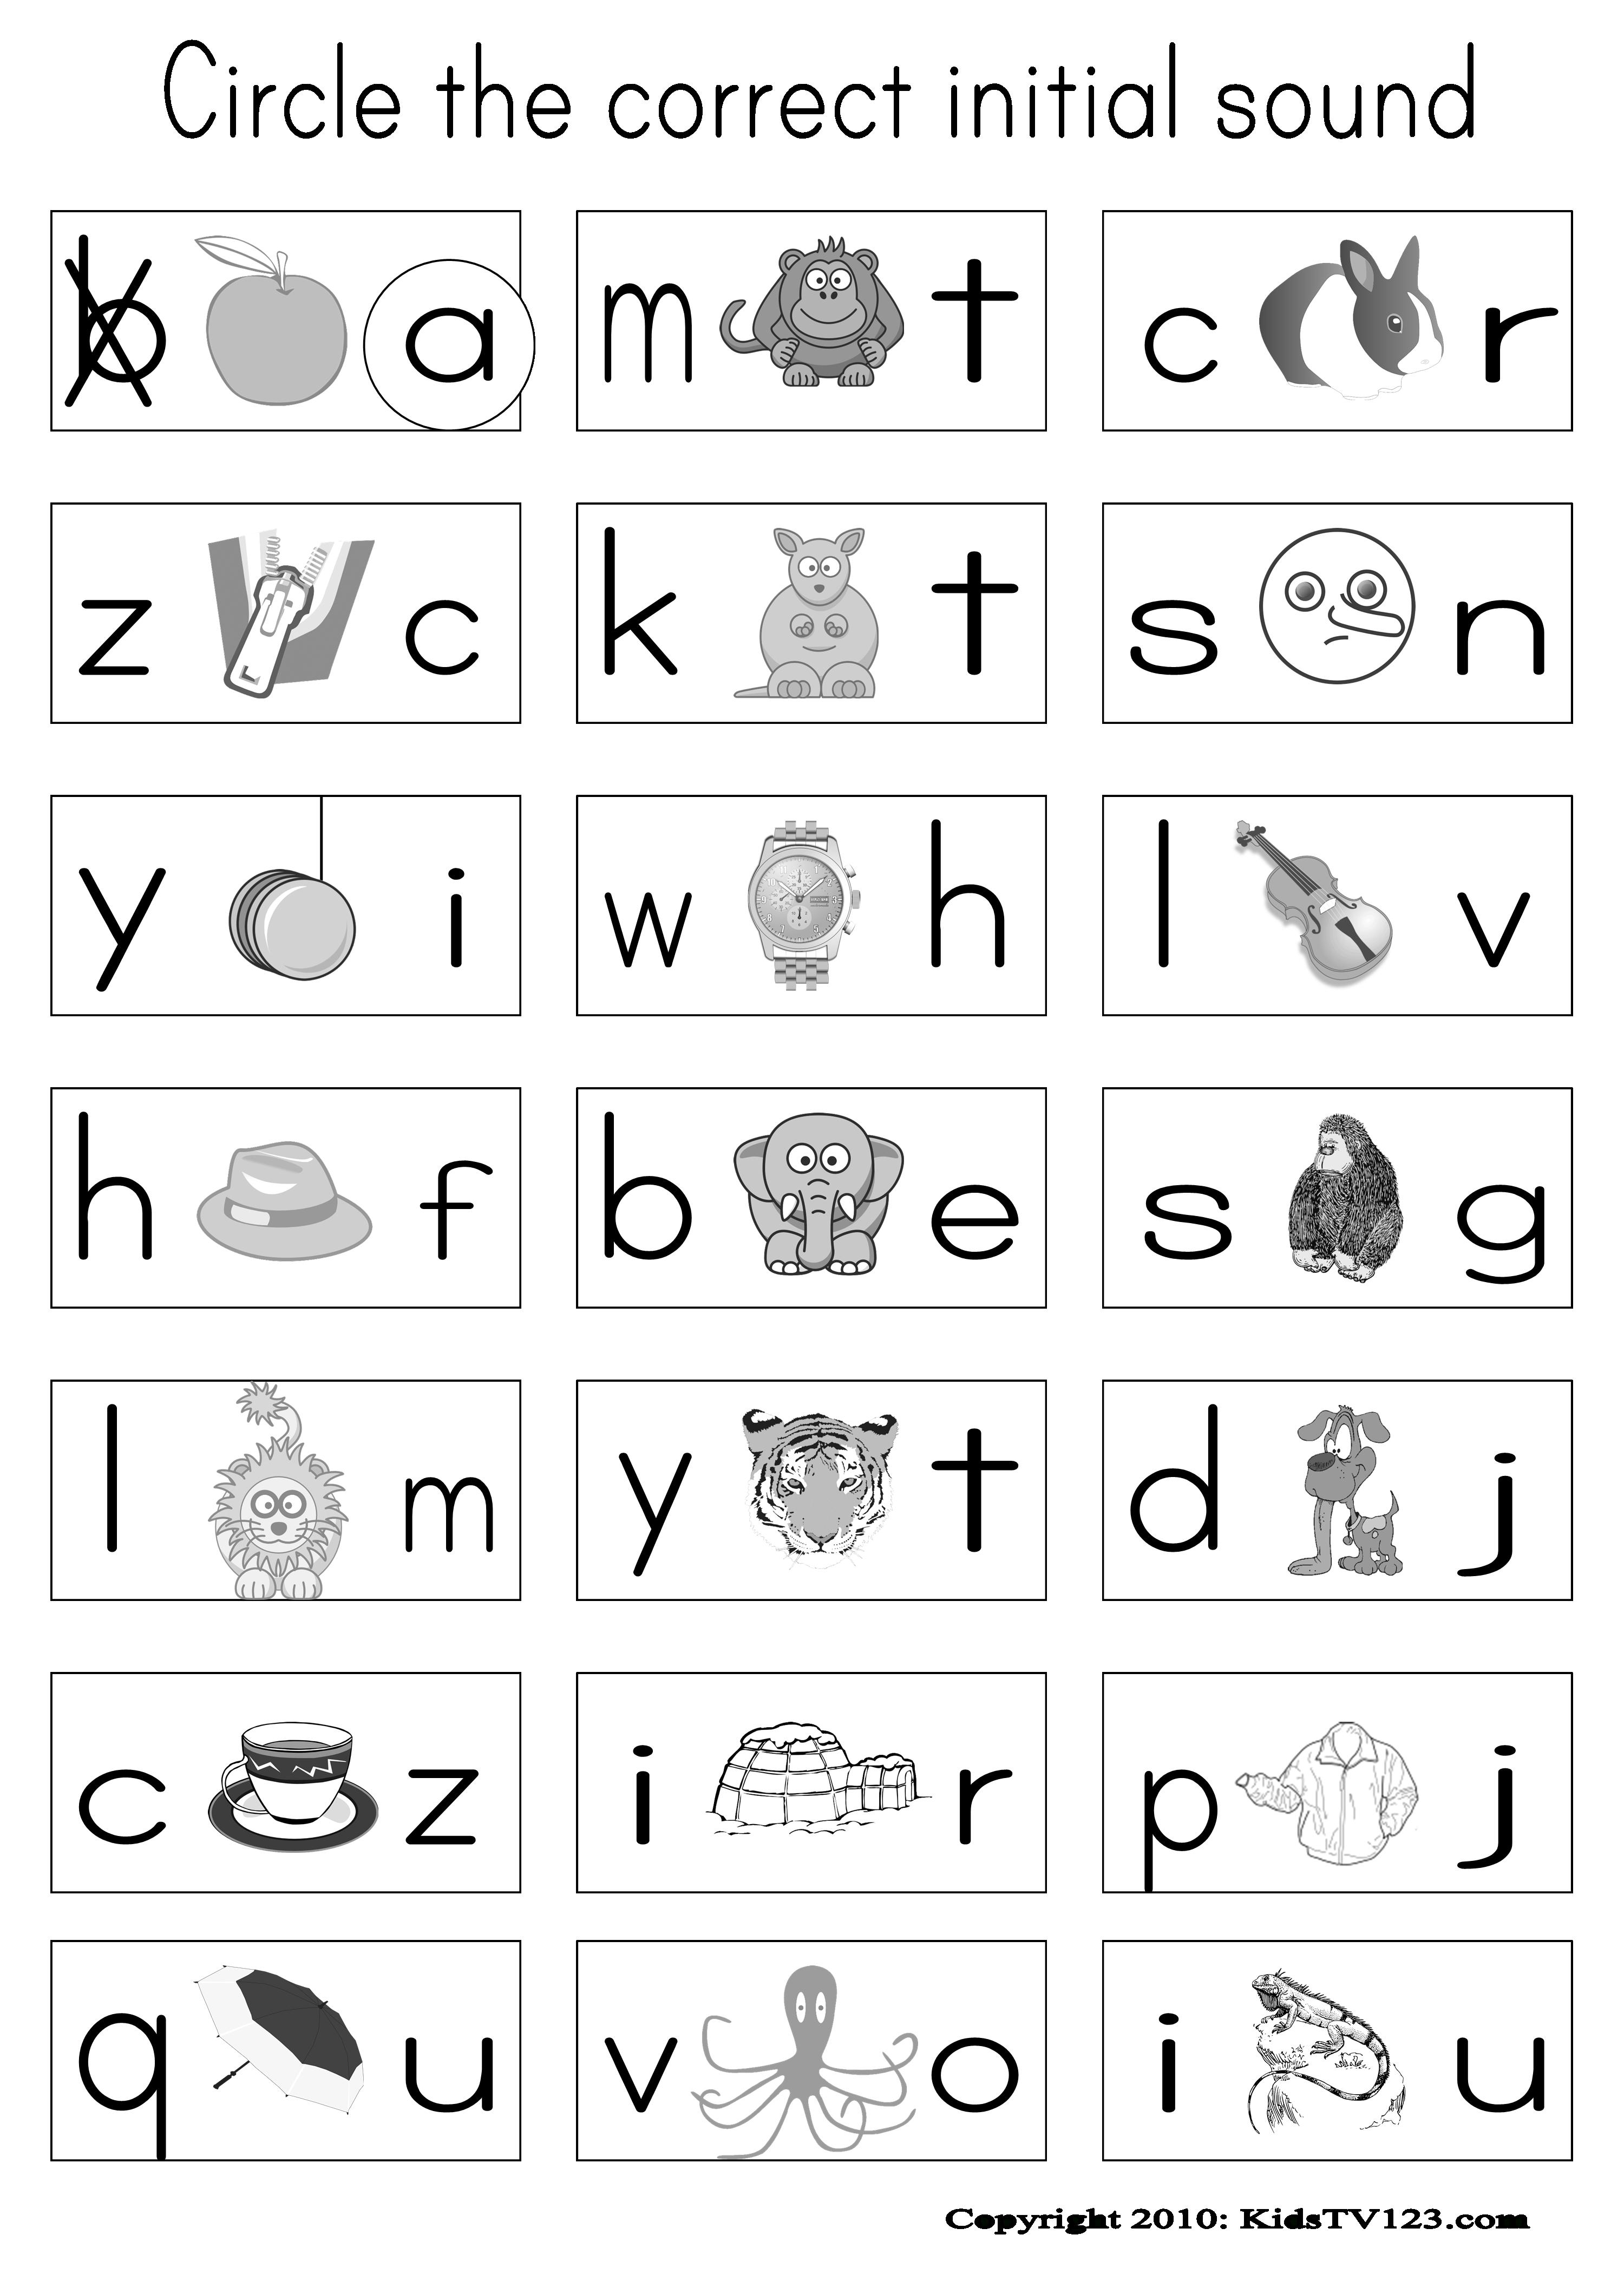 Kidstv123 - Phonics Worksheets | Classroom-Reading & Phonics - Free Printable Phonics Worksheets